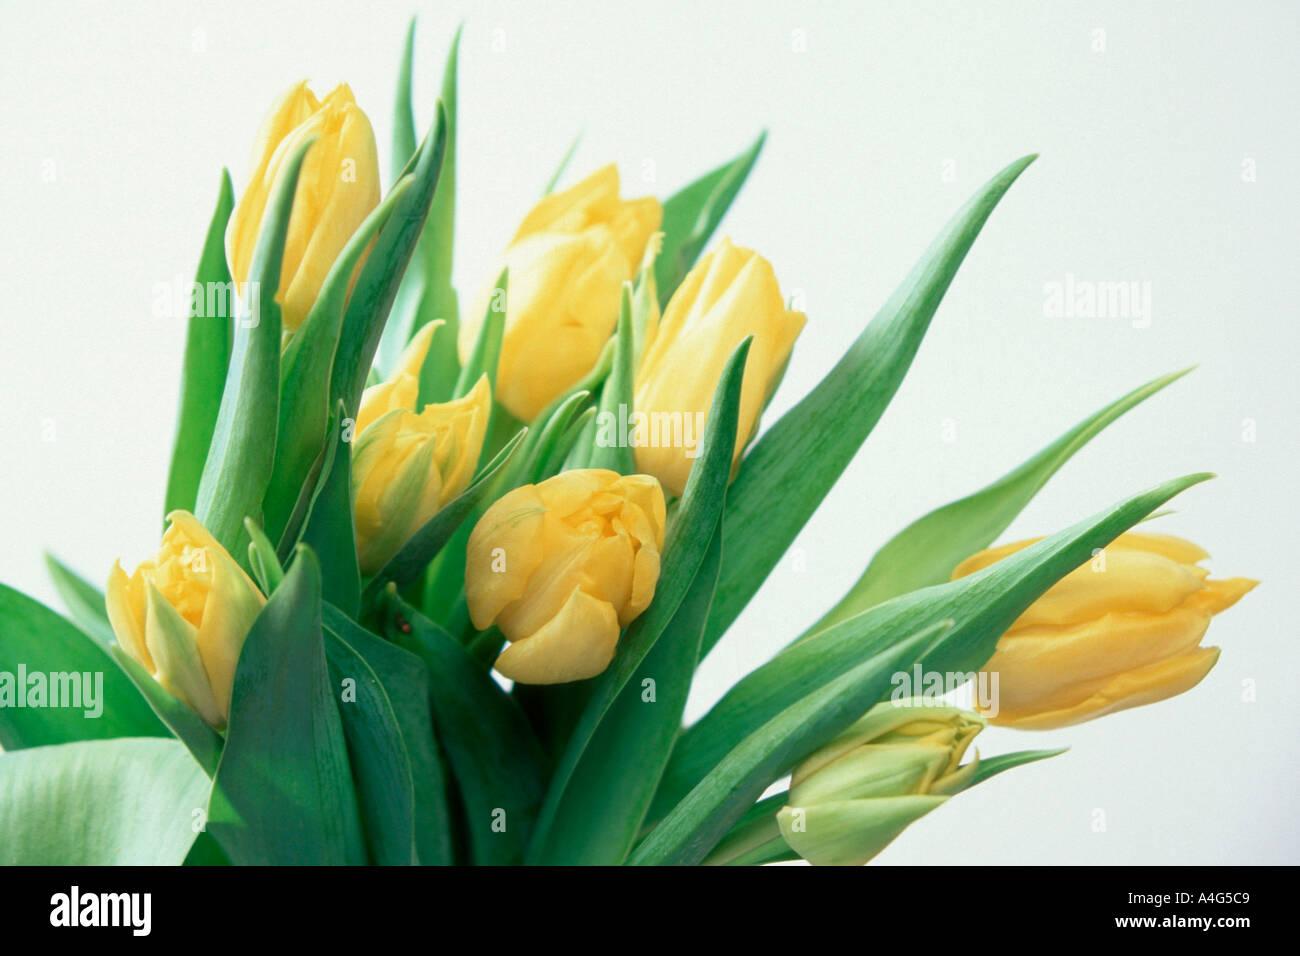 bunch of tulips ornamental plants flowers liliaceae blooming